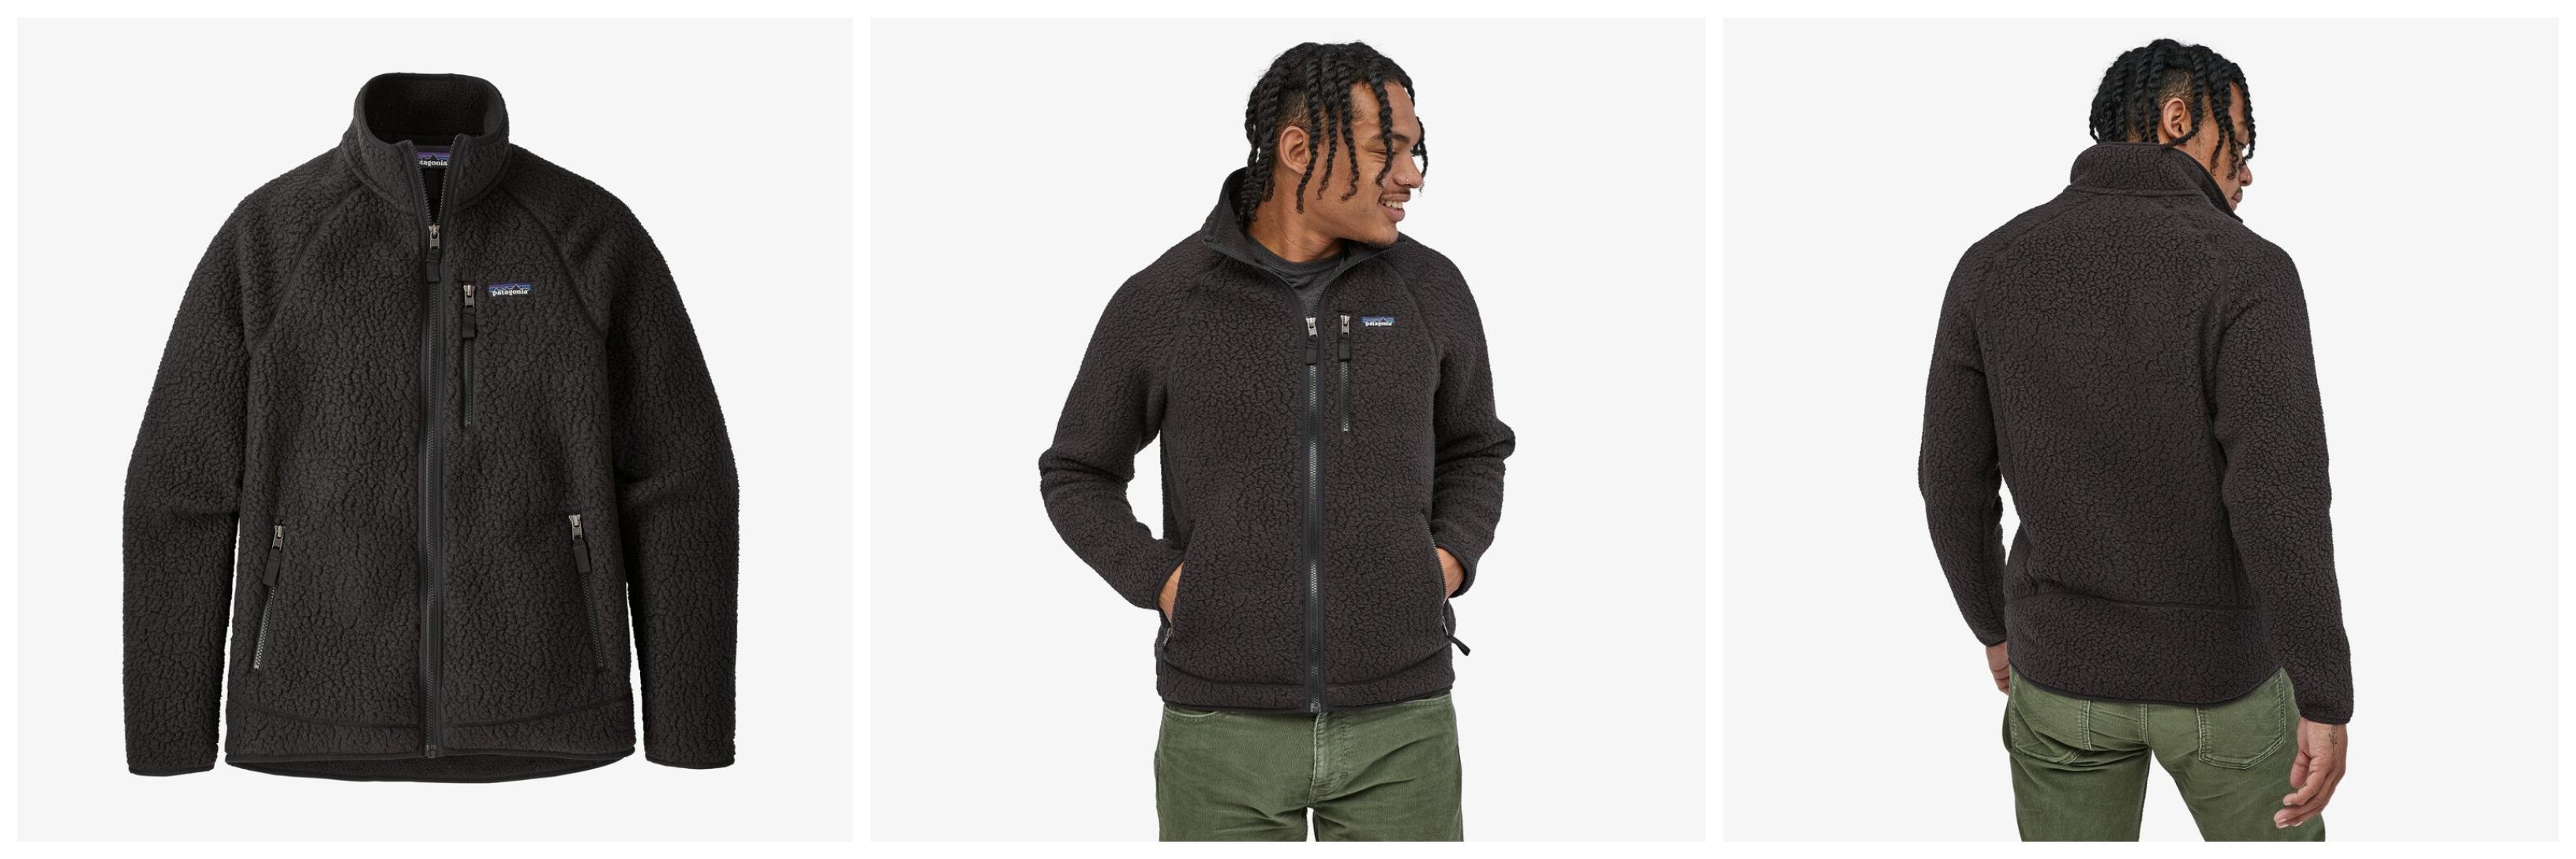 Patagonia Retro Pile Fleece Men's Jacket